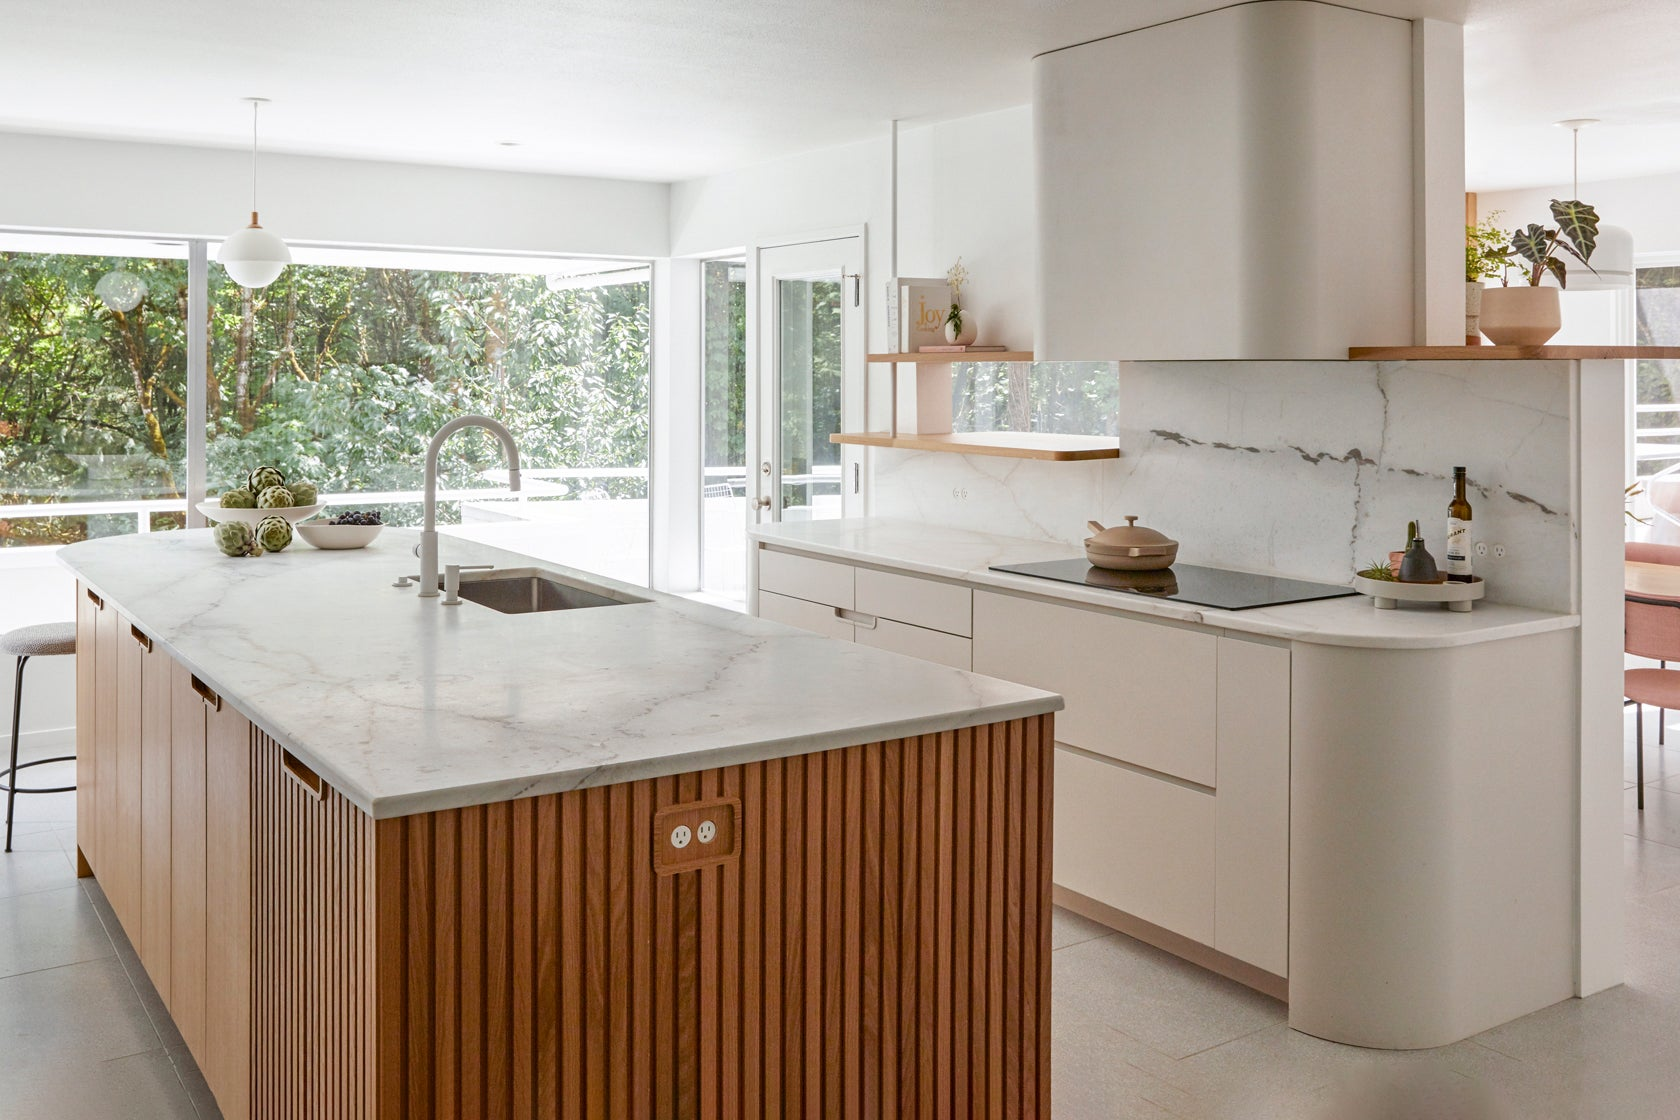 white kitchen with slatted wood island